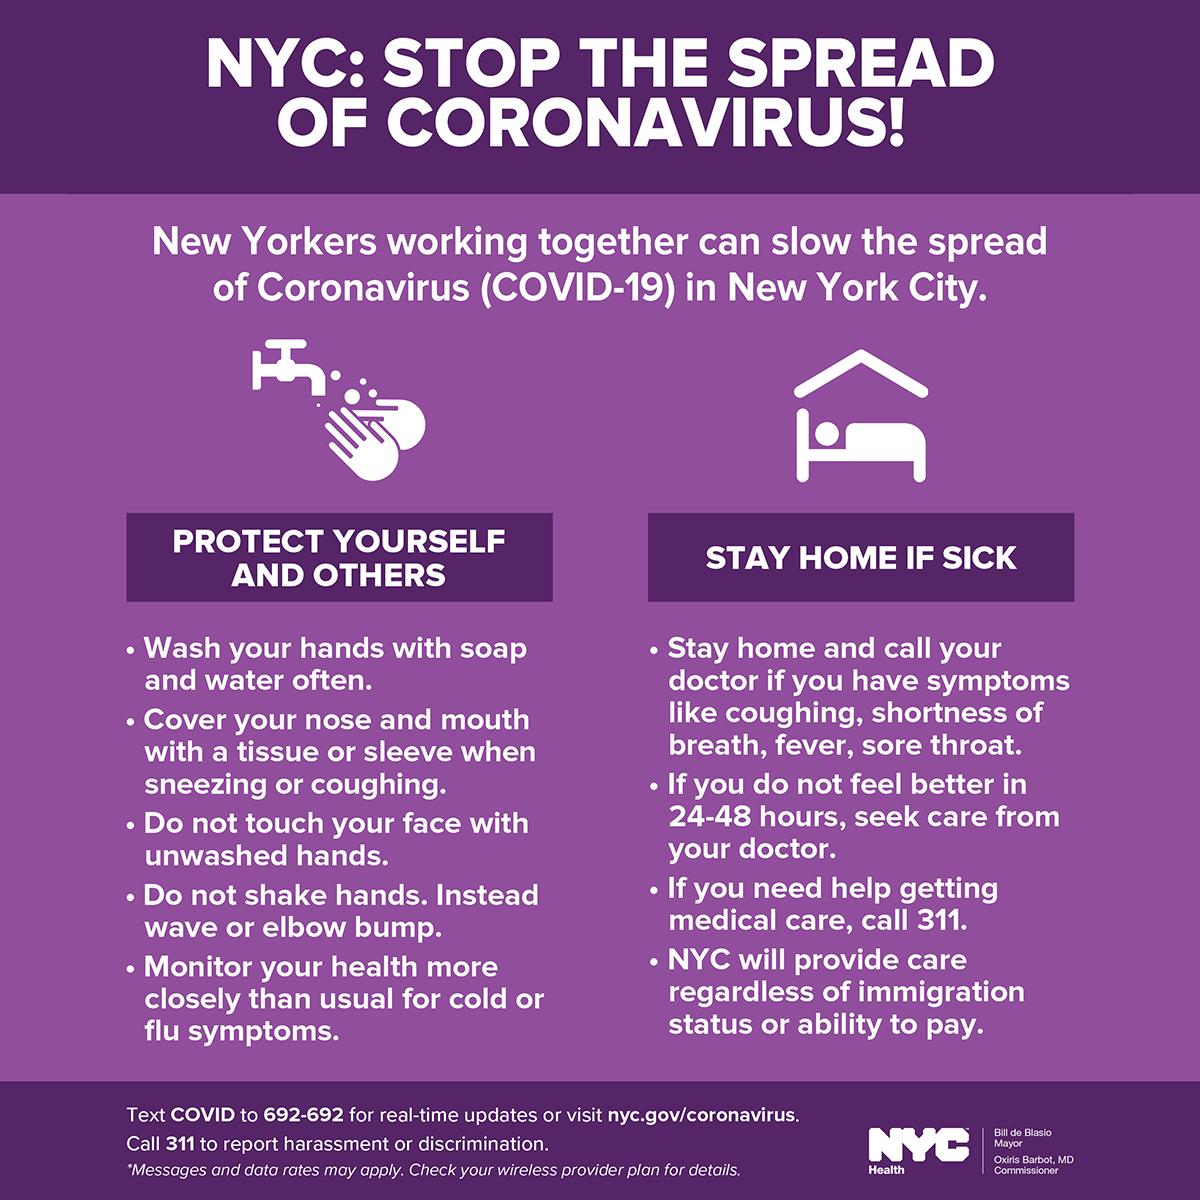 NYC Stop the spread of Coronavirus